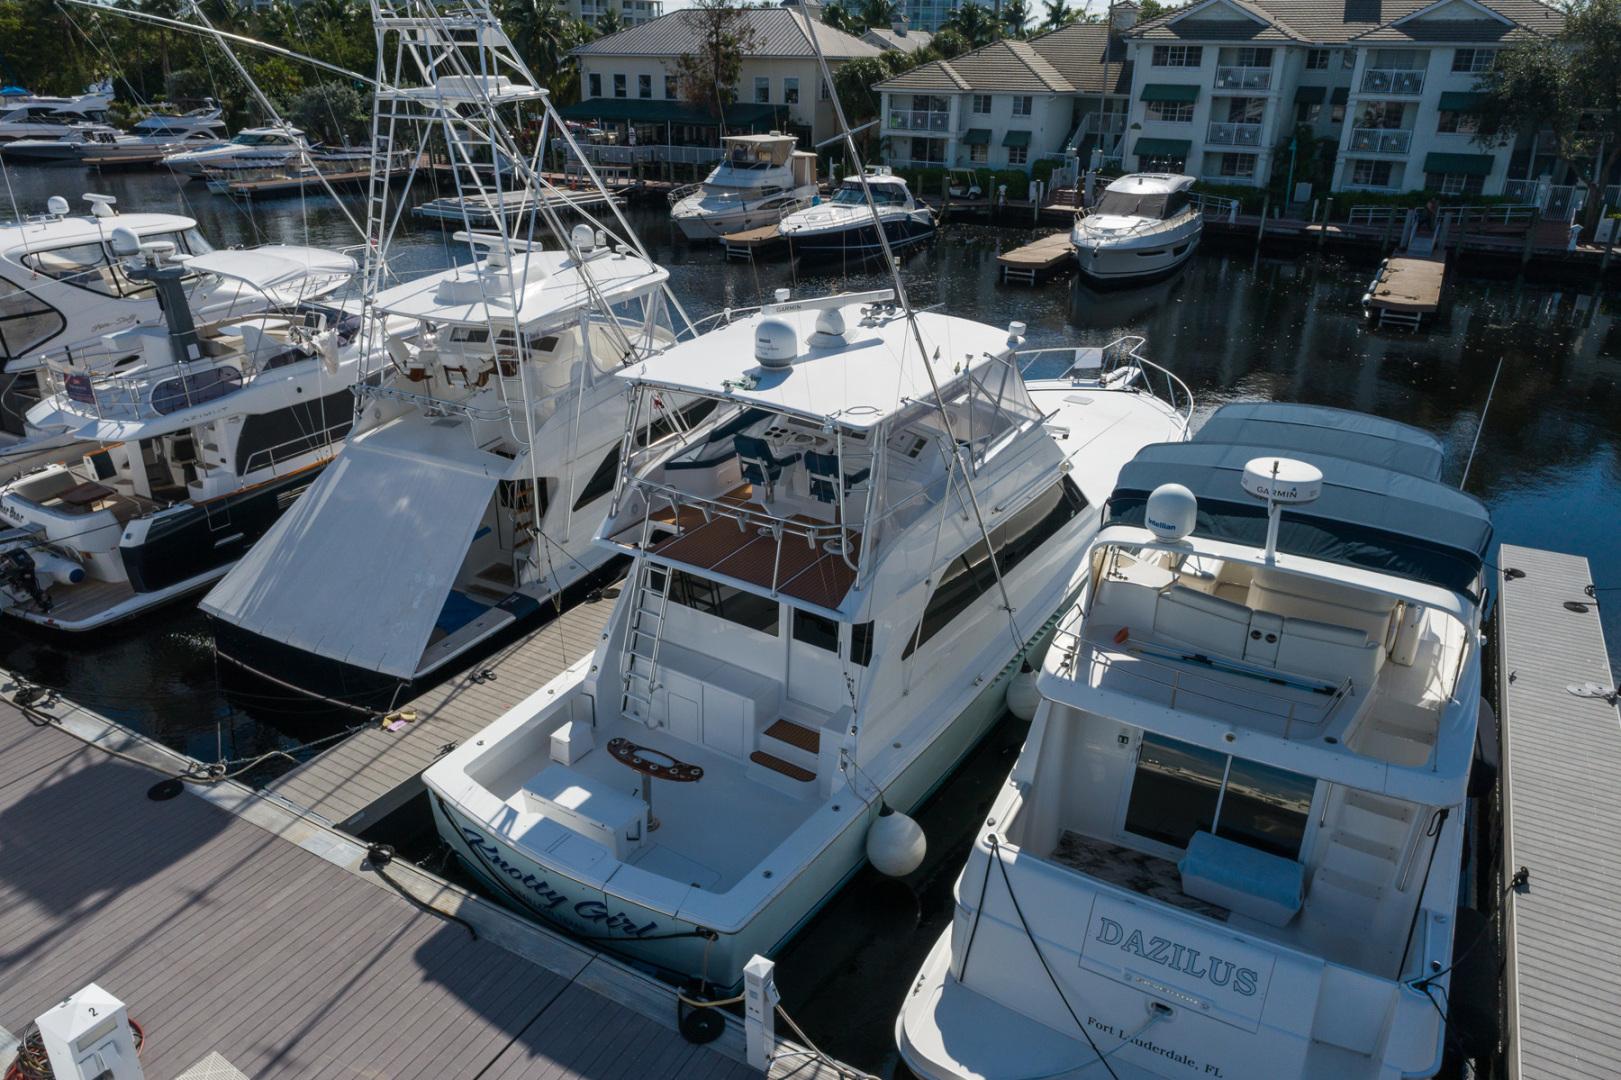 Viking-Convertible 2000-Knotty Girl Fort Lauderdale-Florida-United States-1564787   Thumbnail